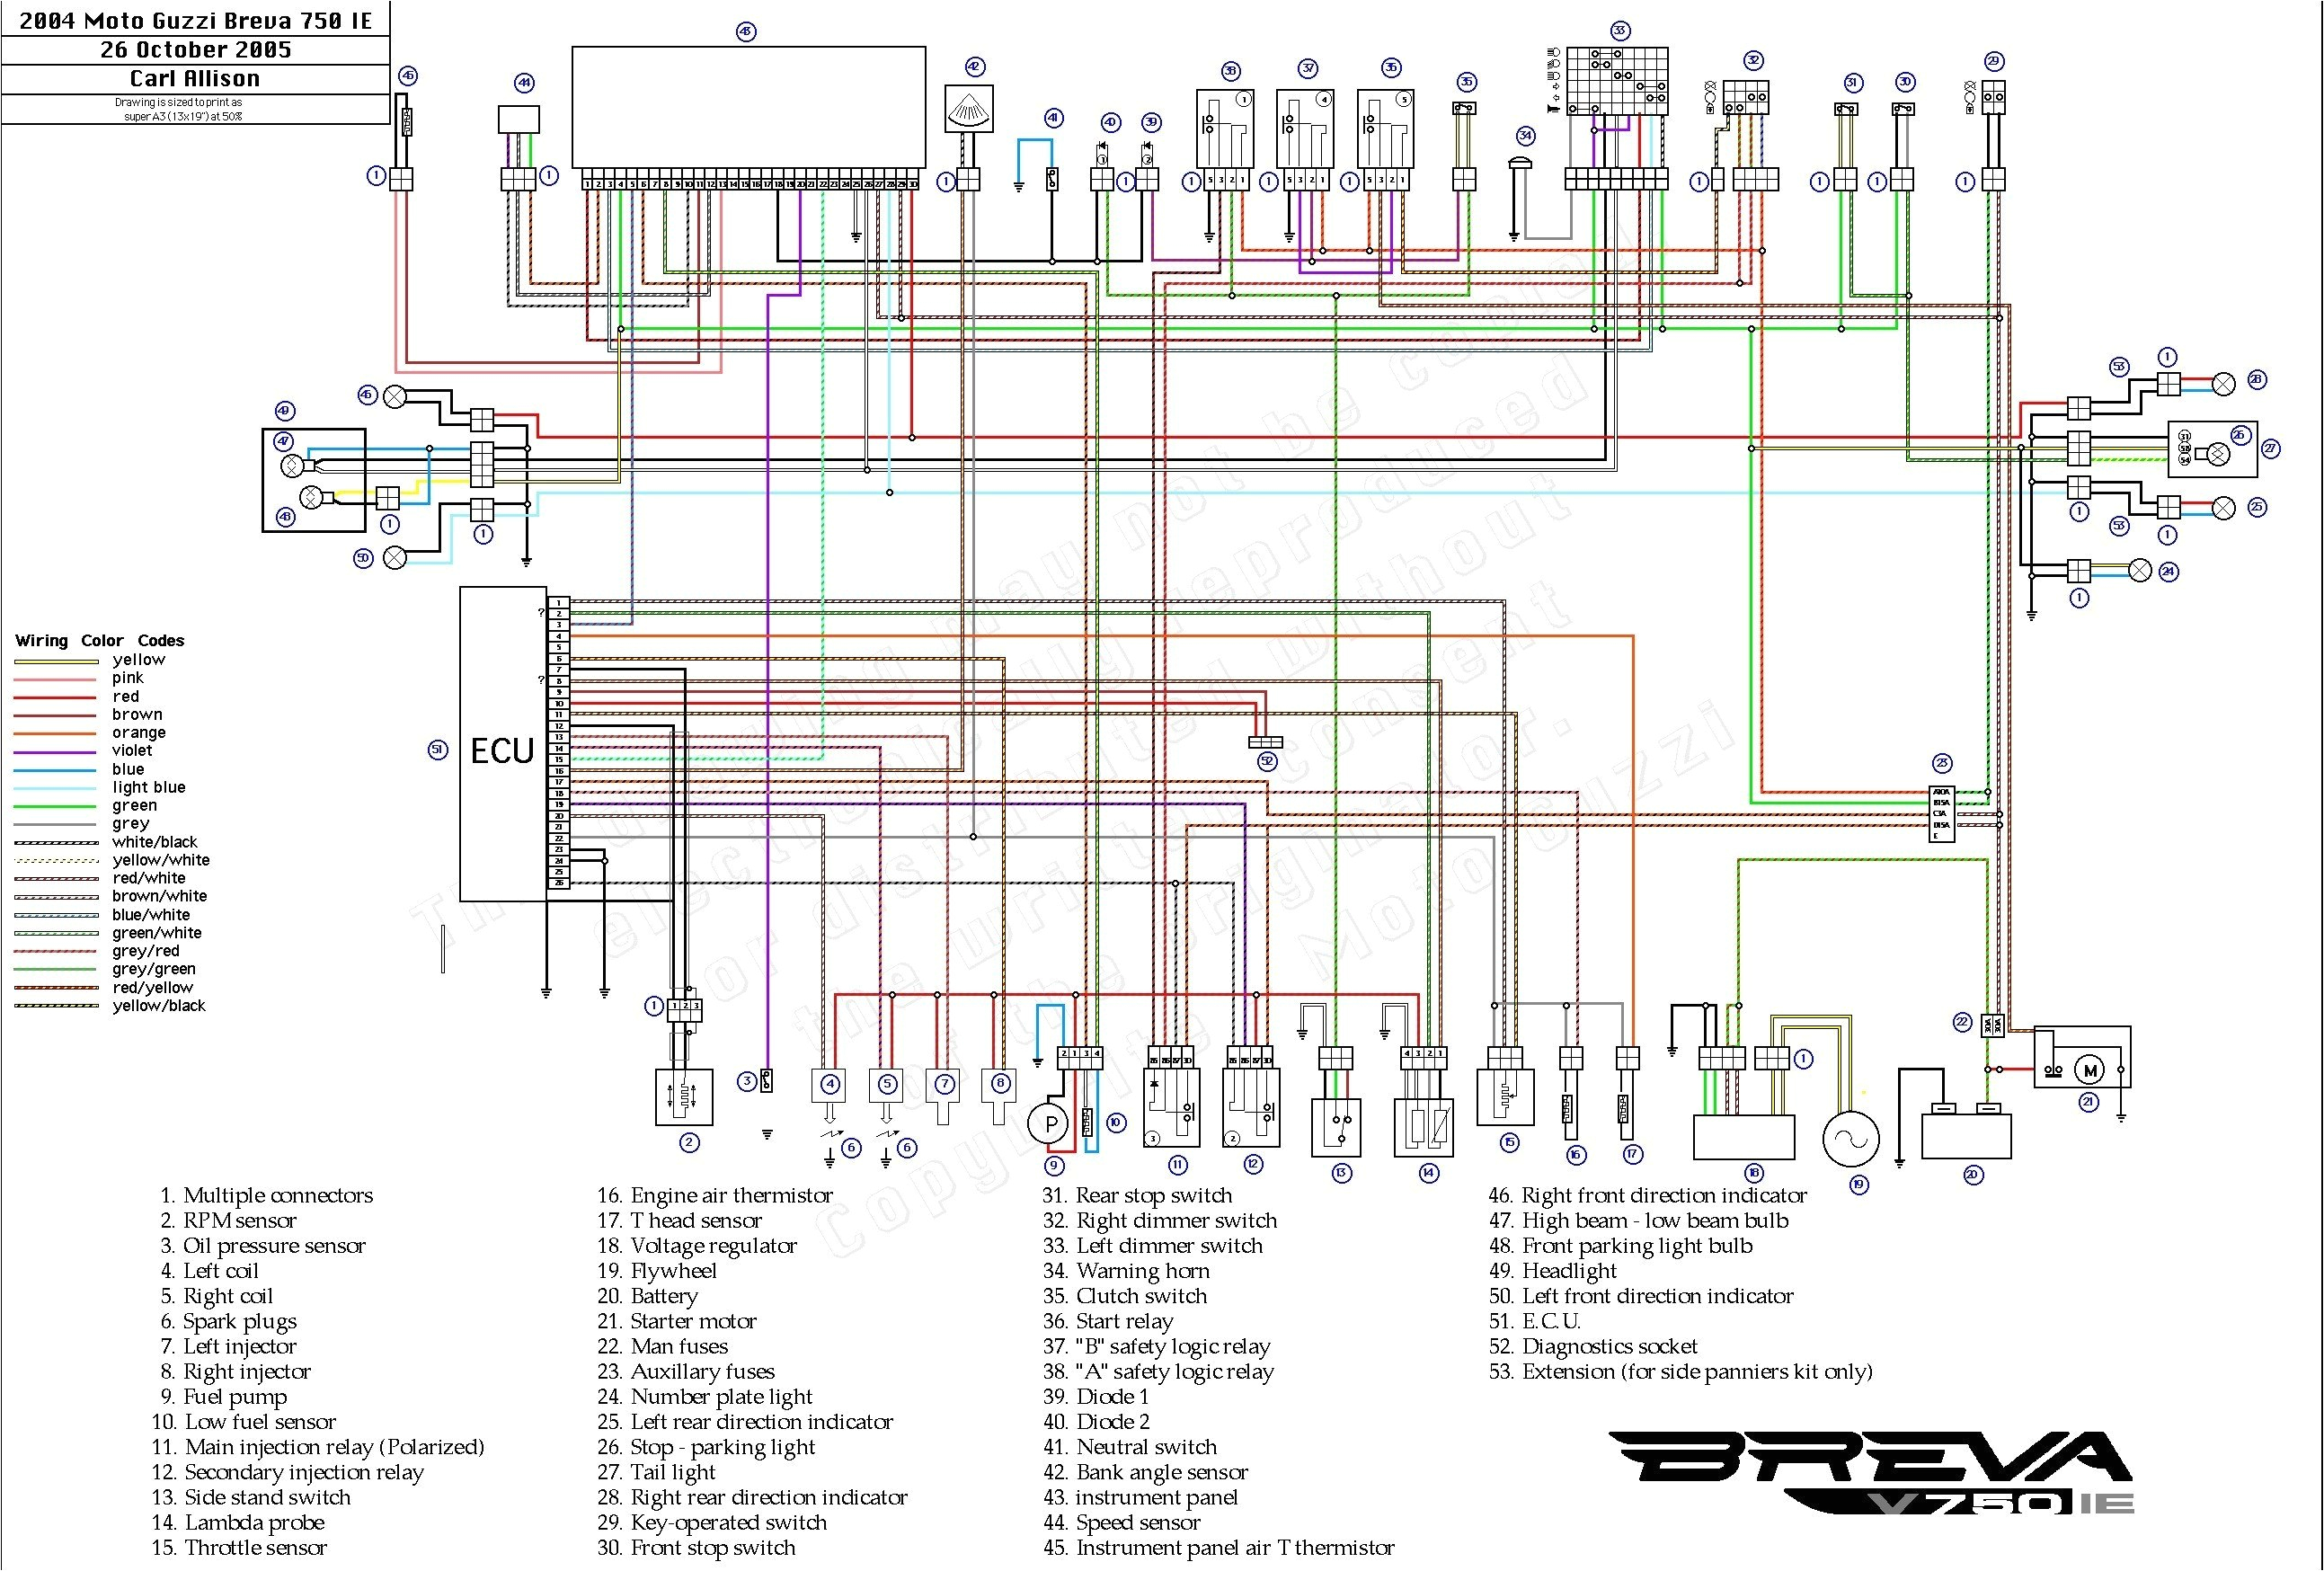 2005 Dodge Ram 3500 Wiring Diagram Dodge Ram 1500 Rear Axle Schematic Get Free Image About Wiring